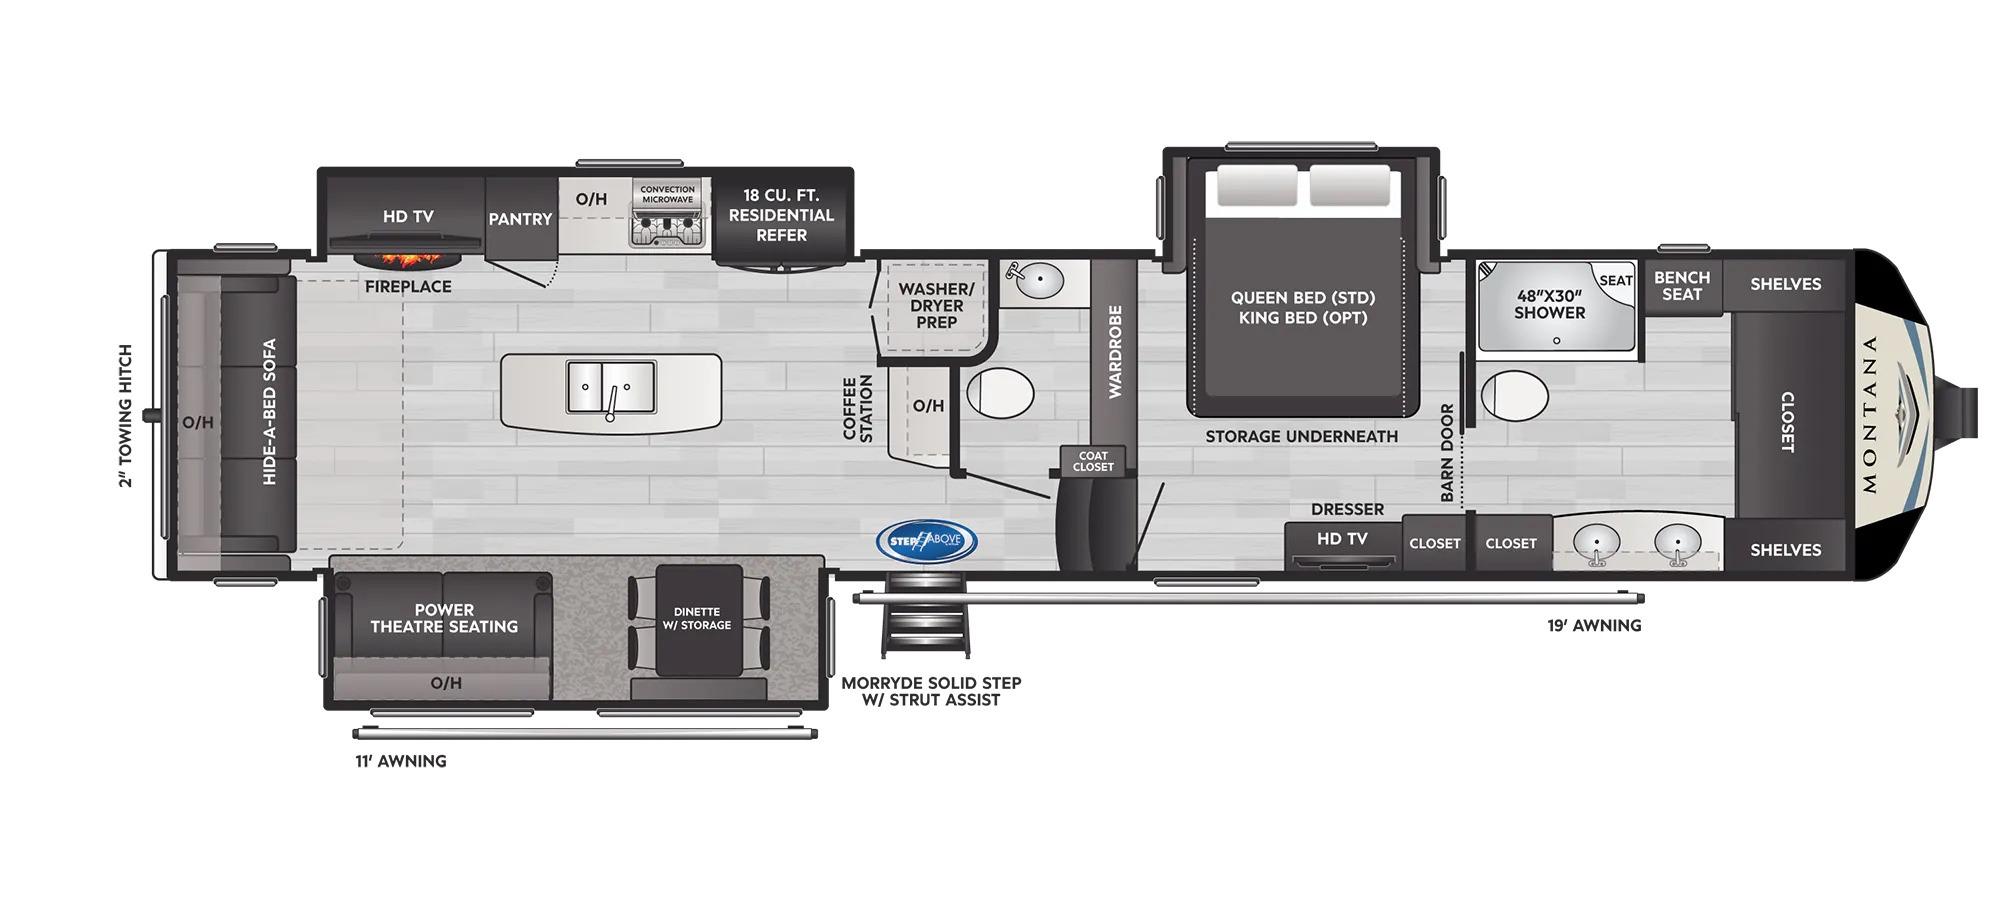 View Floor Plan for 2022 KEYSTONE MONTANA 3931FB